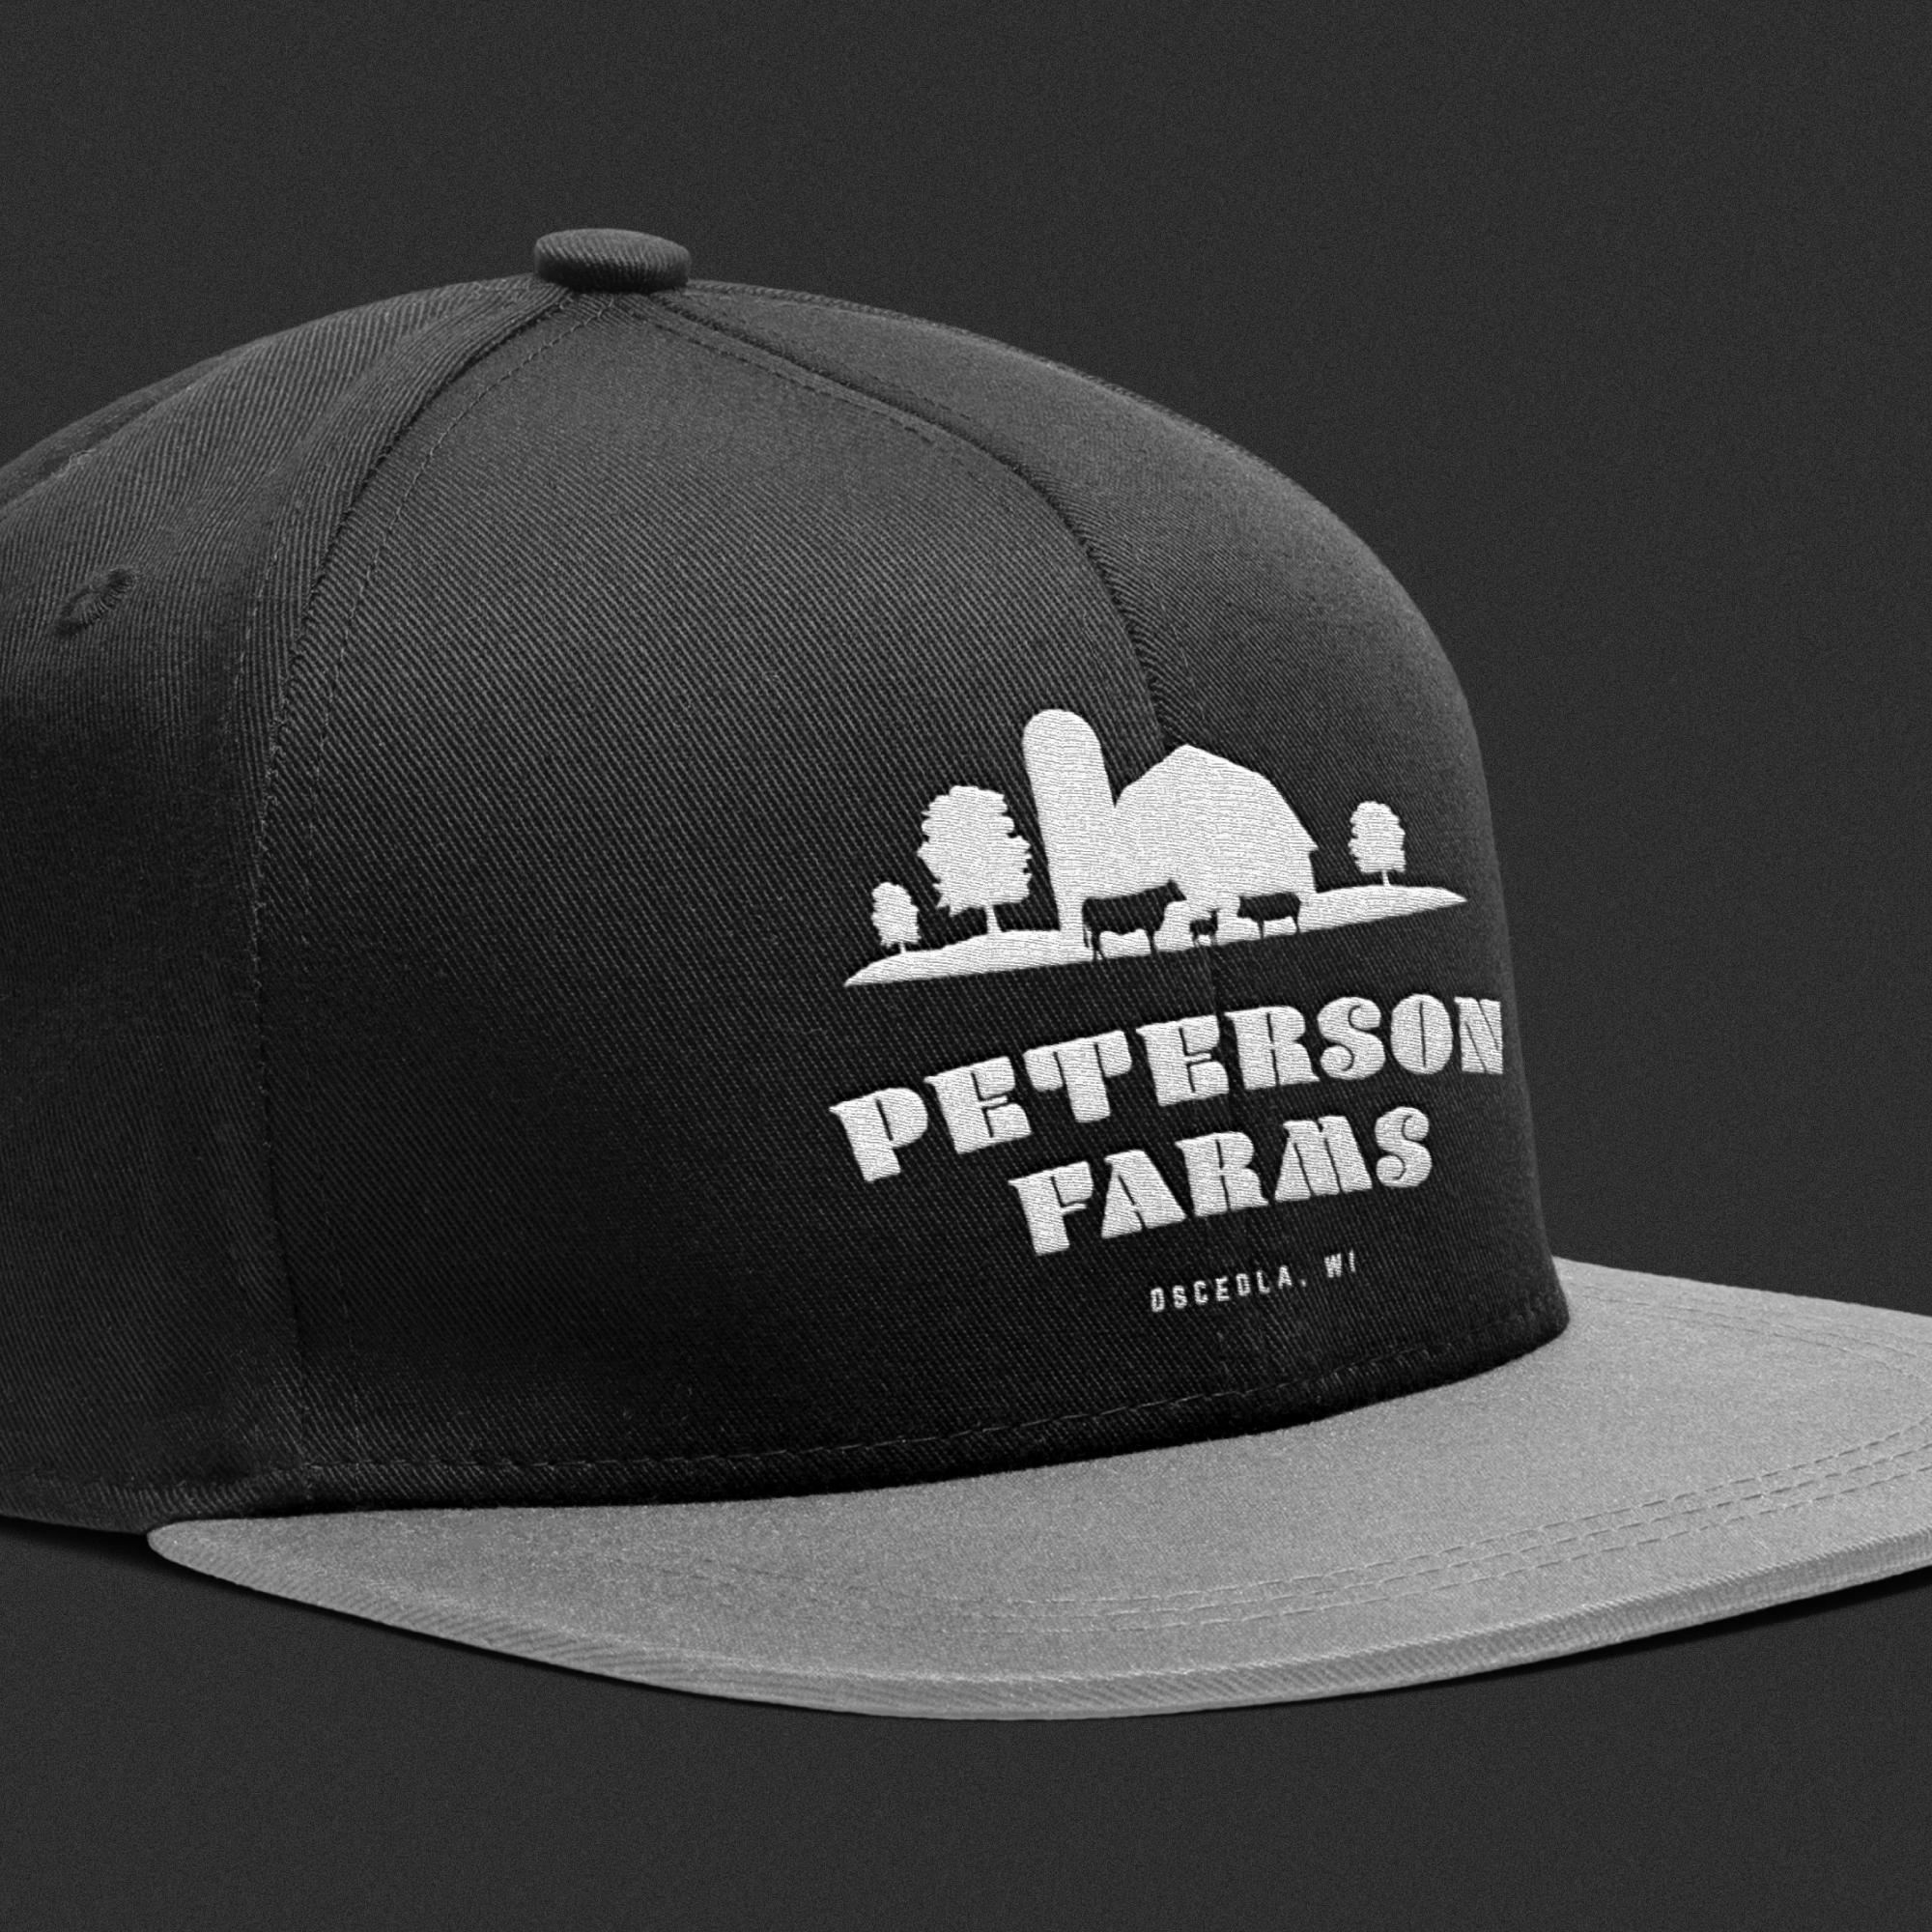 Peterson Craftsman Meats | Design